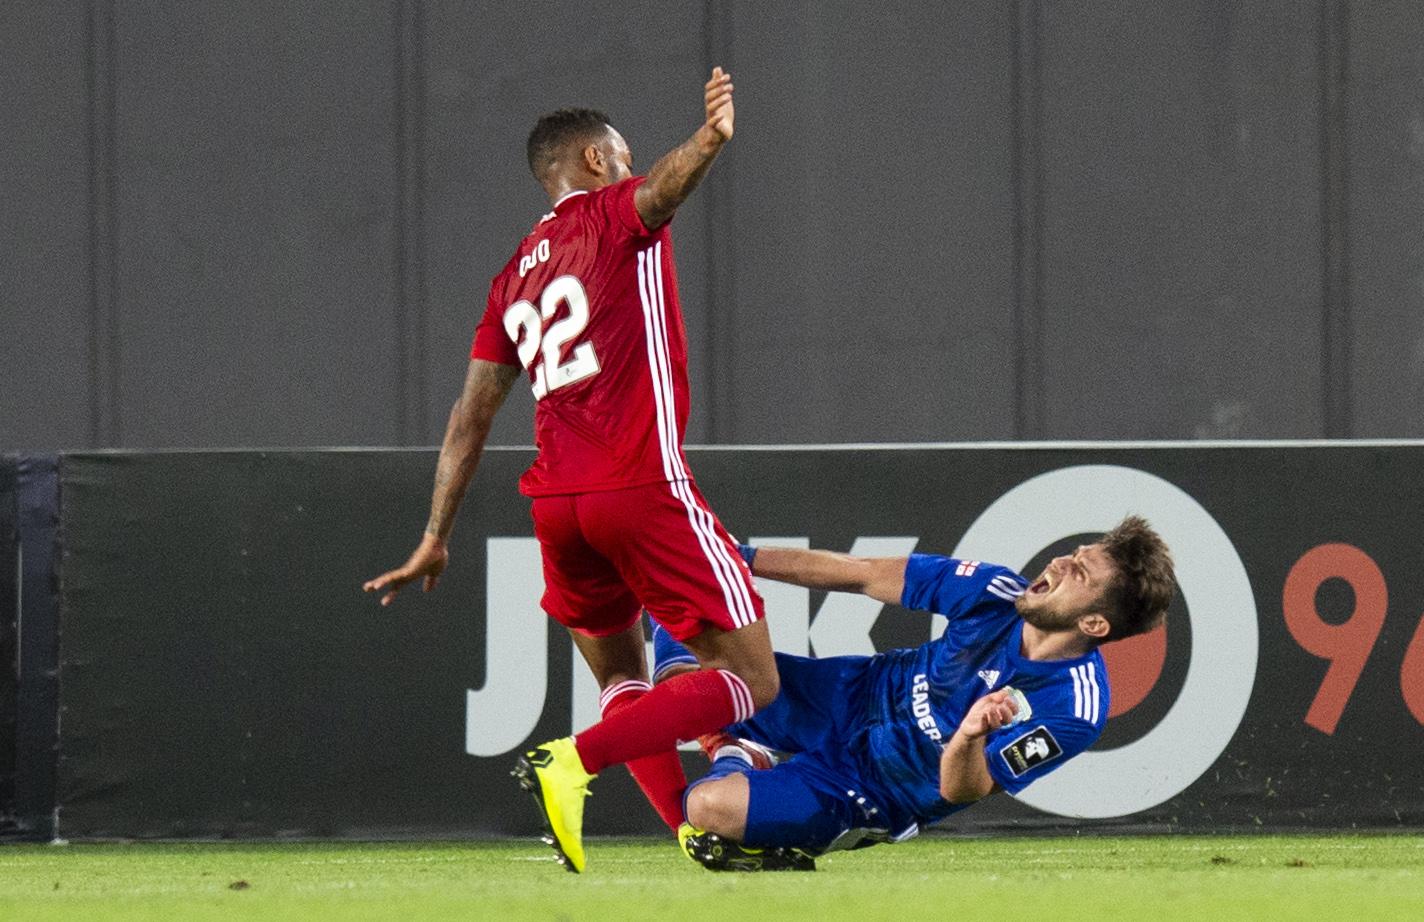 Irakli Lekvtadze goes down to win a penalty.